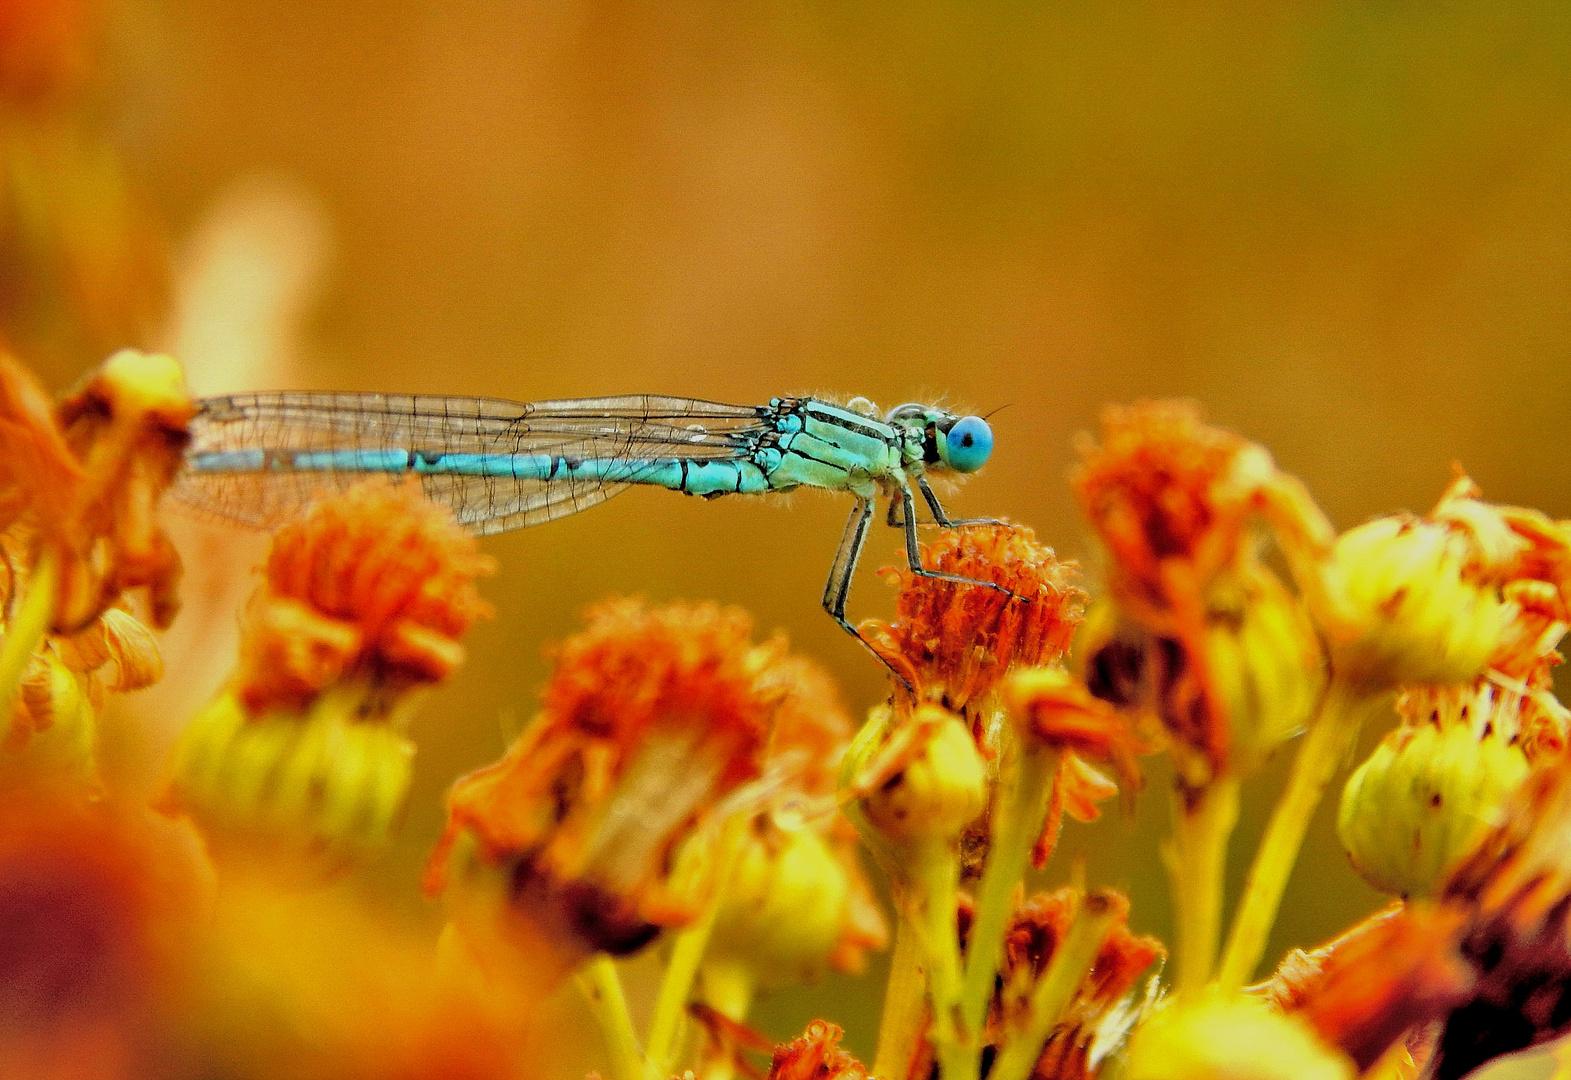 Blue light in the natur